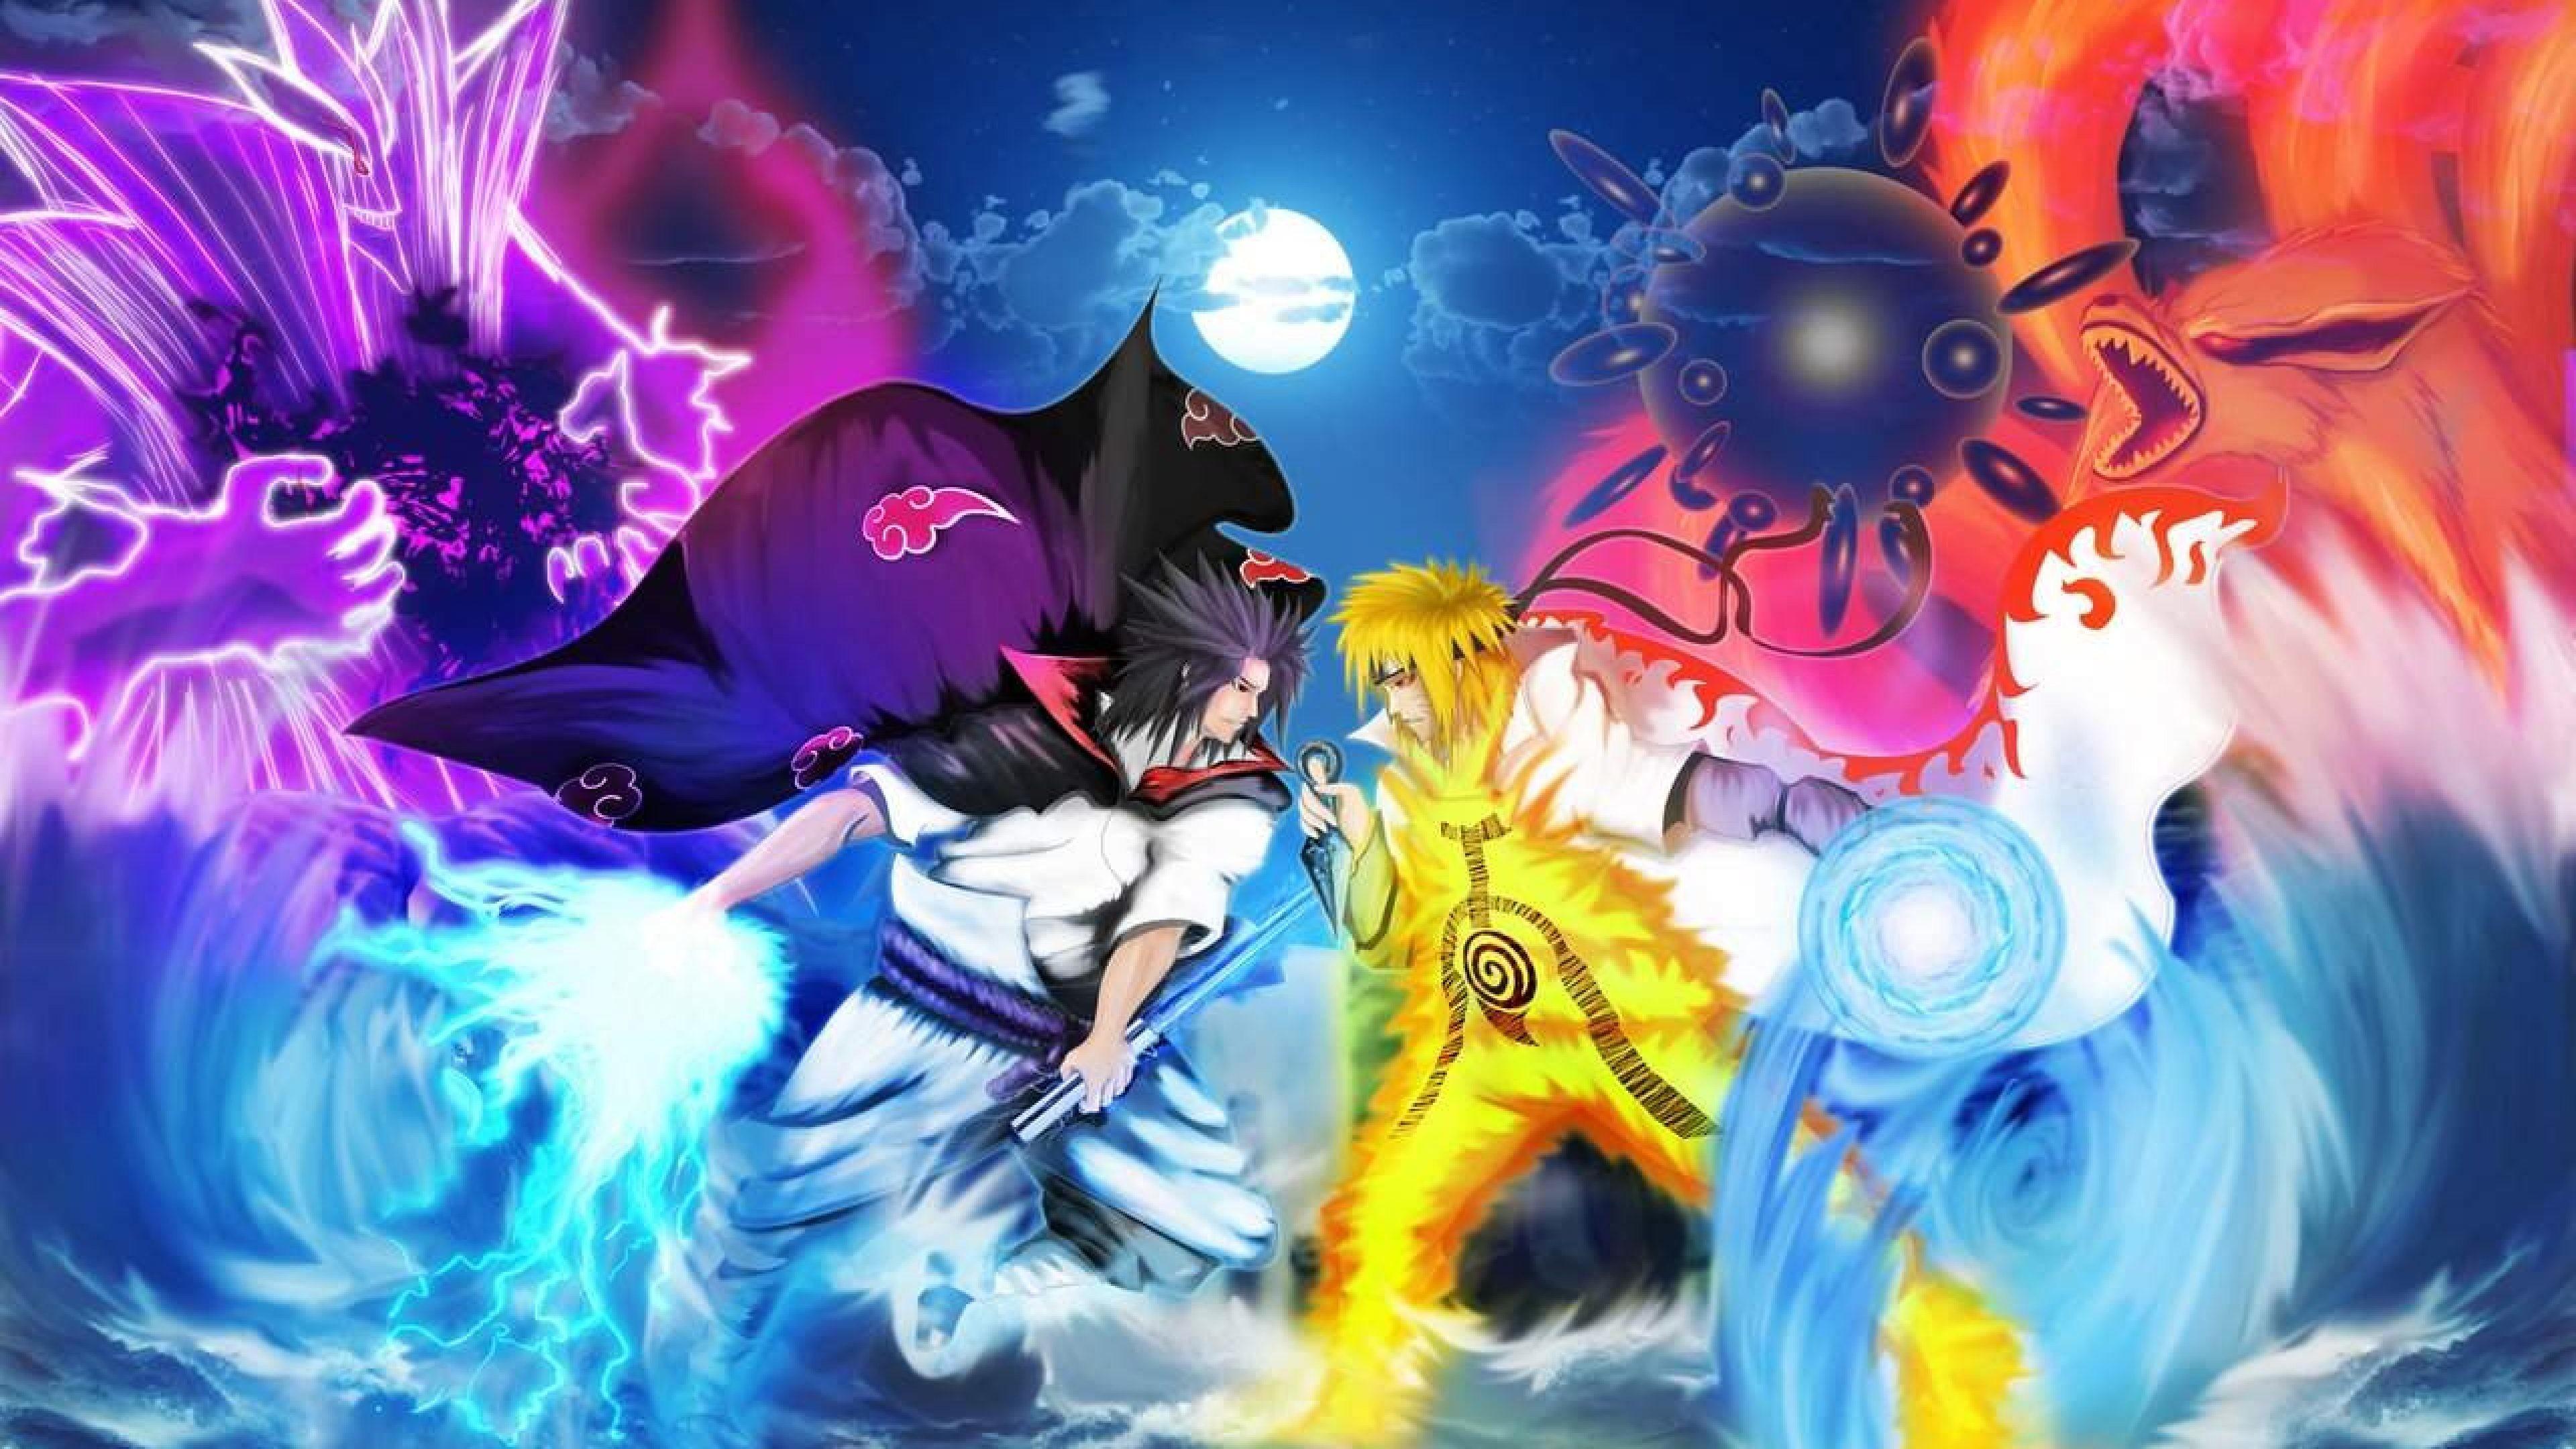 Naruto Shippuden Wallpaper Hd For Desktop